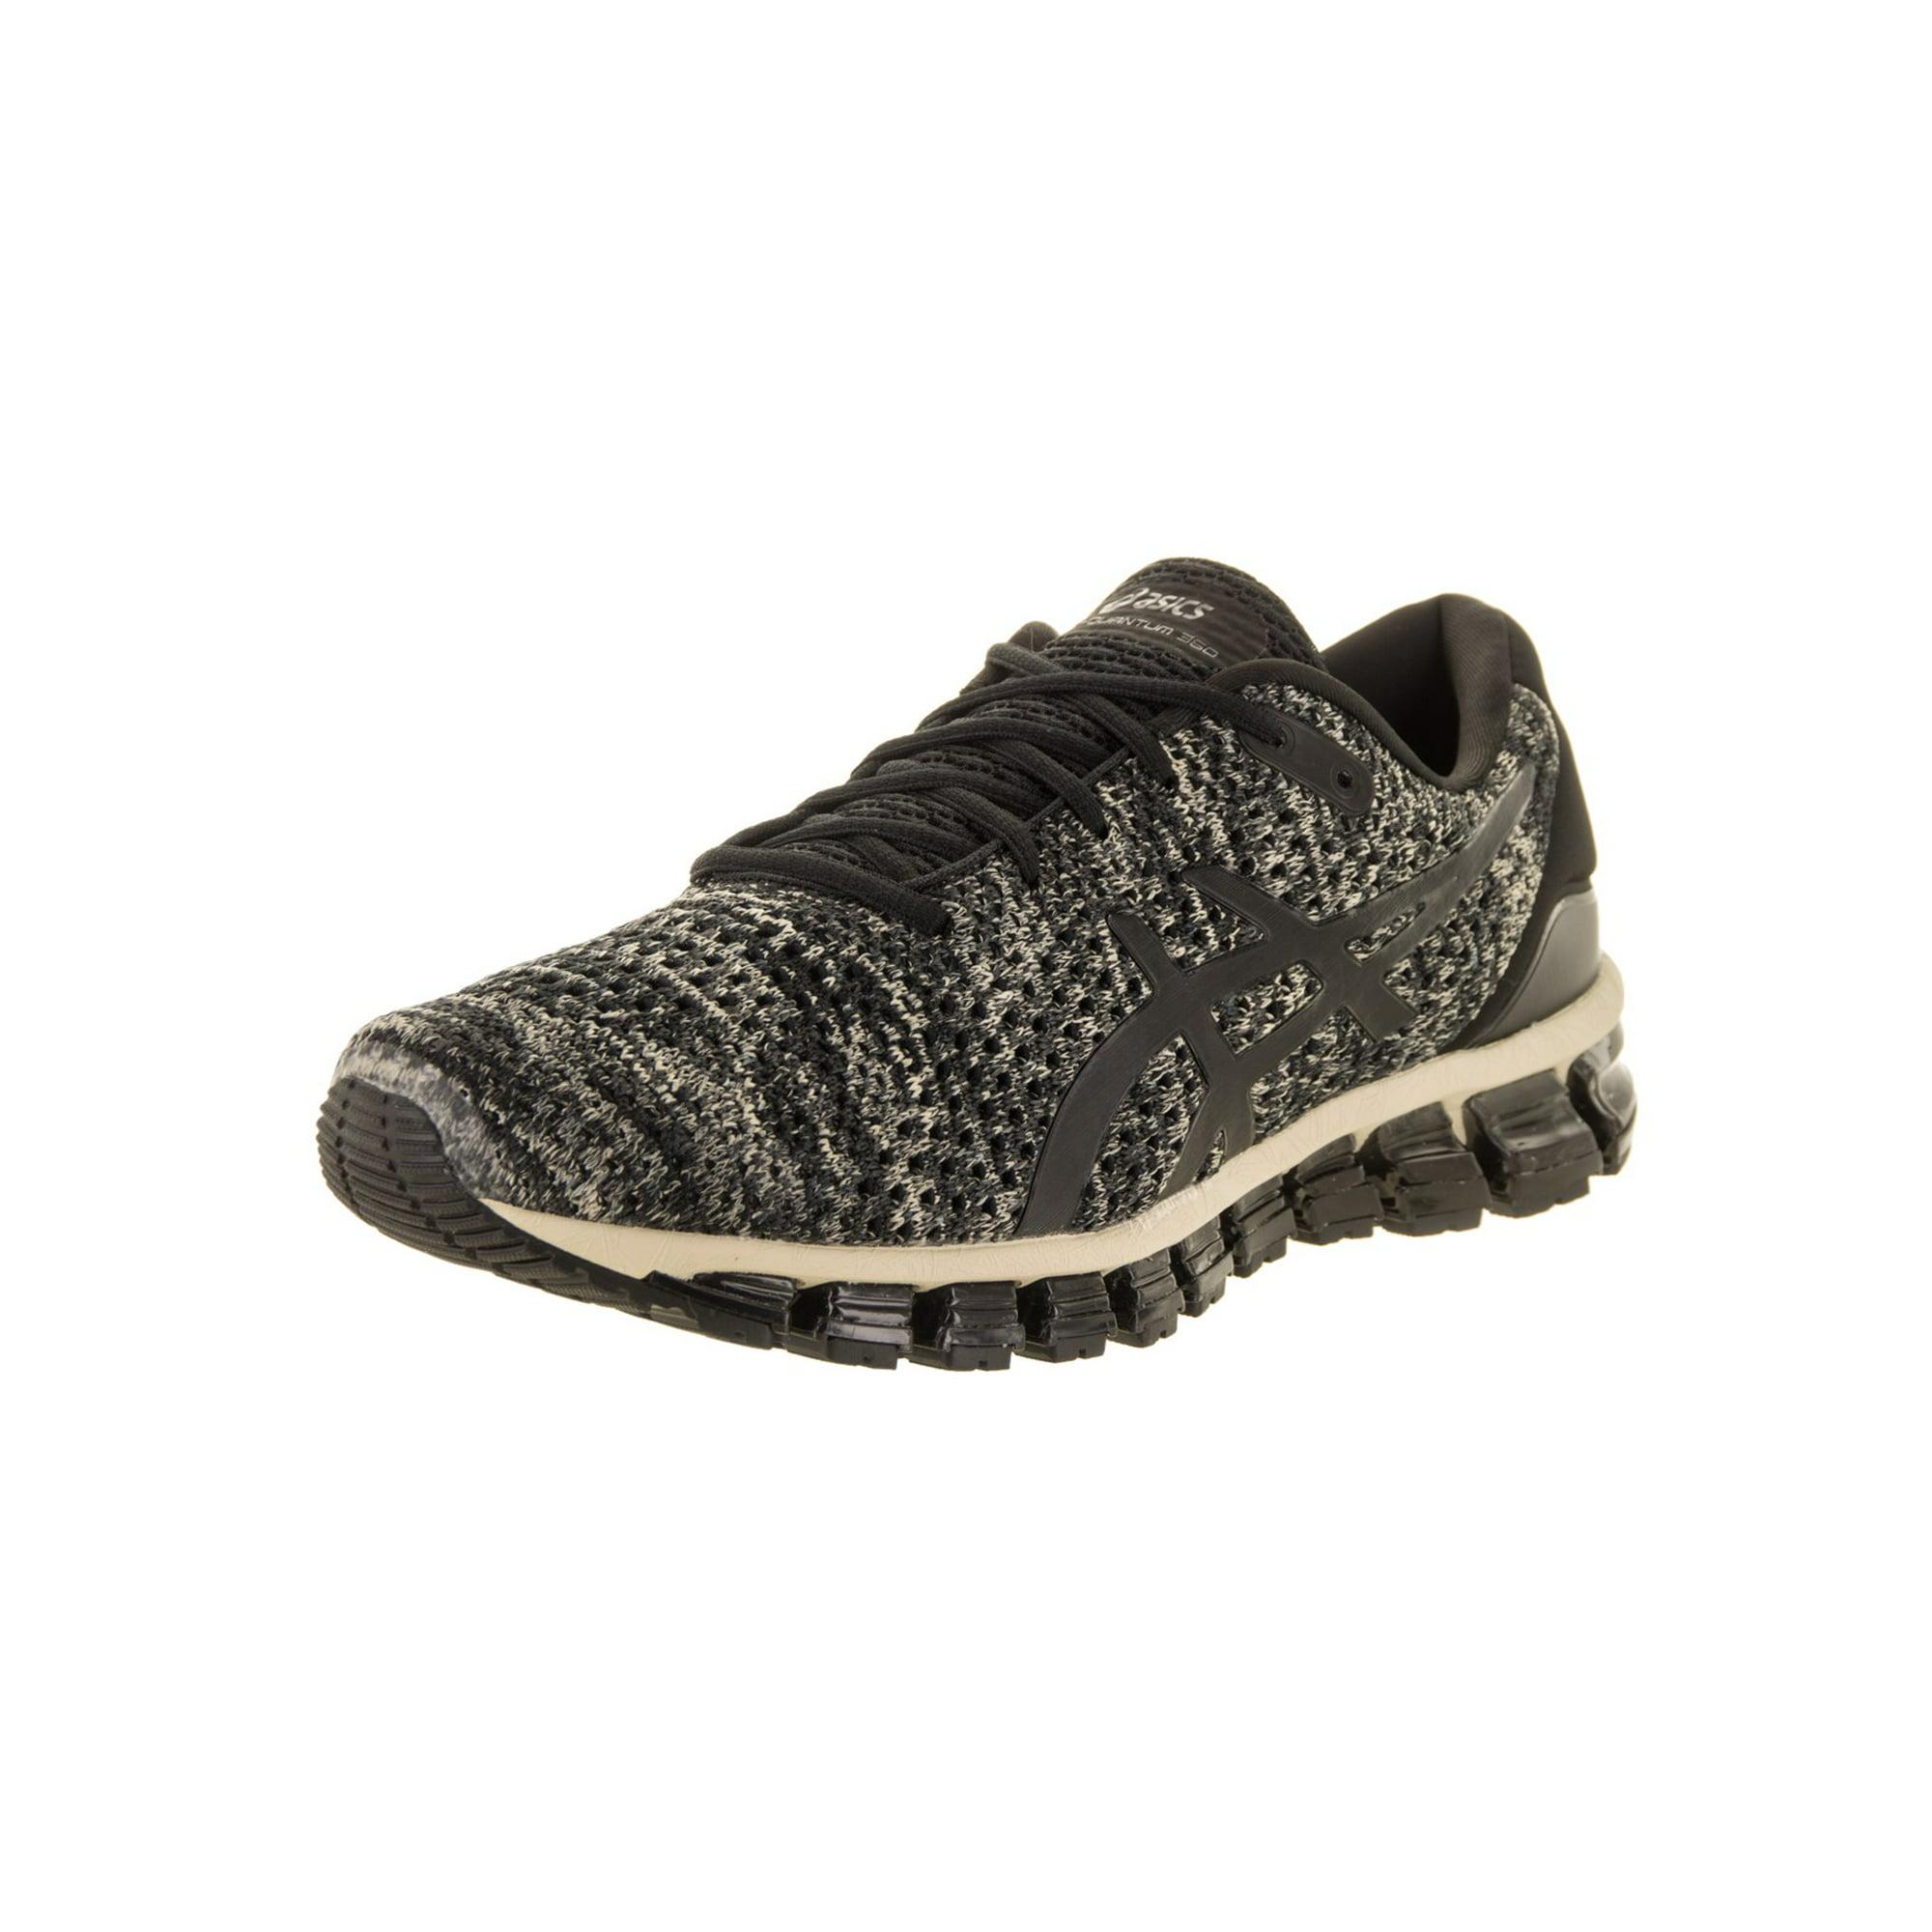 new style b58c9 06e0b Asics Men's Gel-Quantum 360 Knit 2 Running Shoe